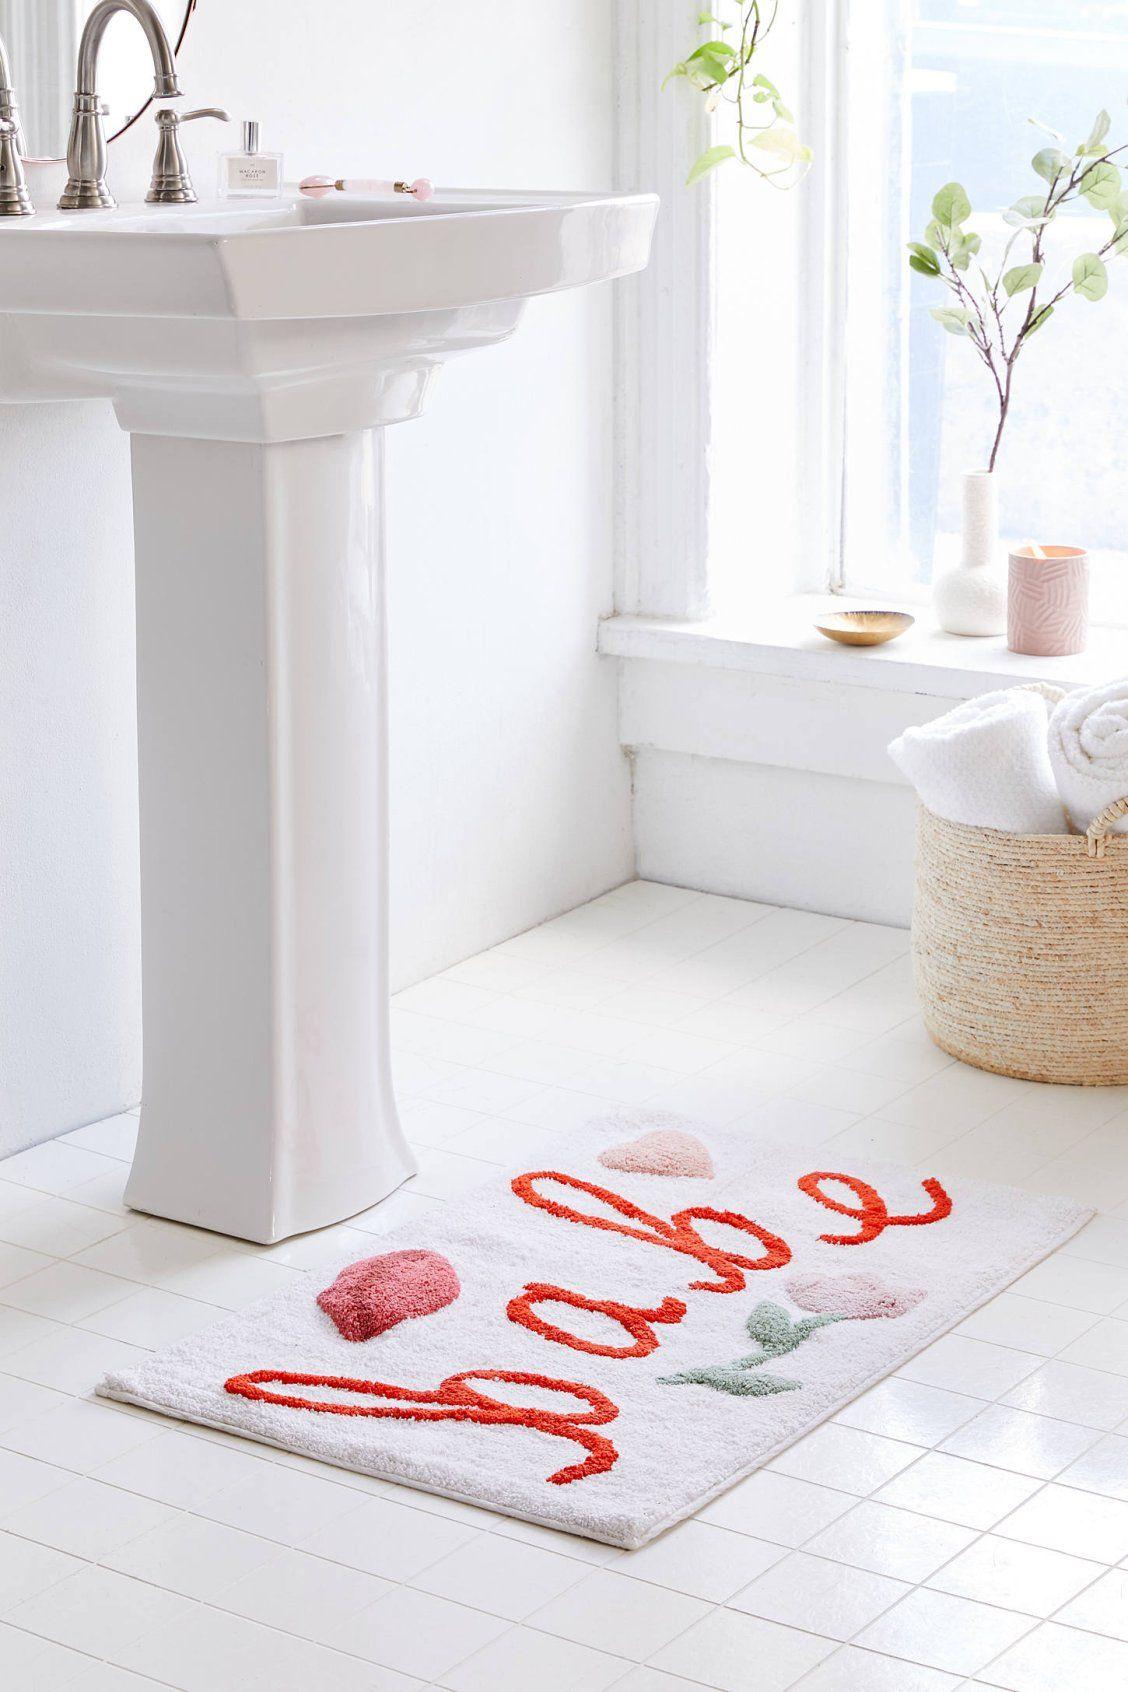 Babe Bath Mat Bathroom Rugs Purple Bathroom Rug Red Bathroom Rugs [ 1692 x 1128 Pixel ]